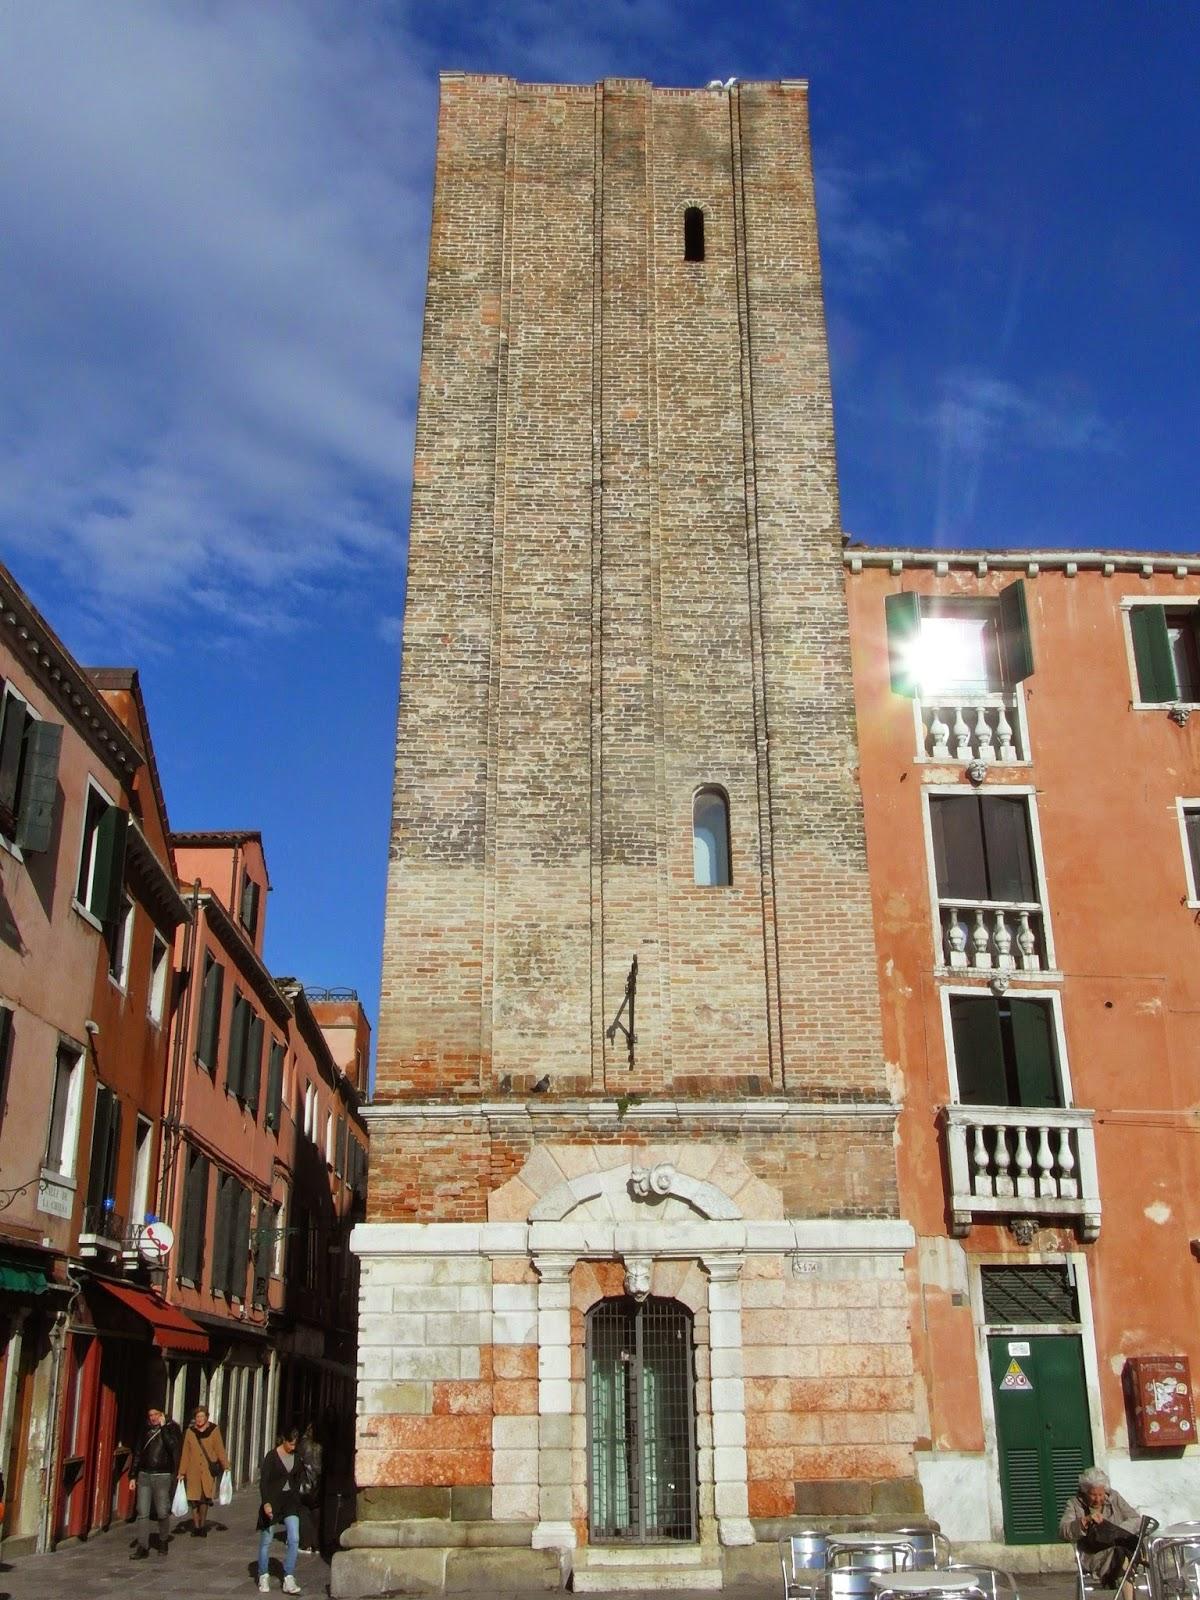 The bell tower, or campanile, Santa Margarita, Venice